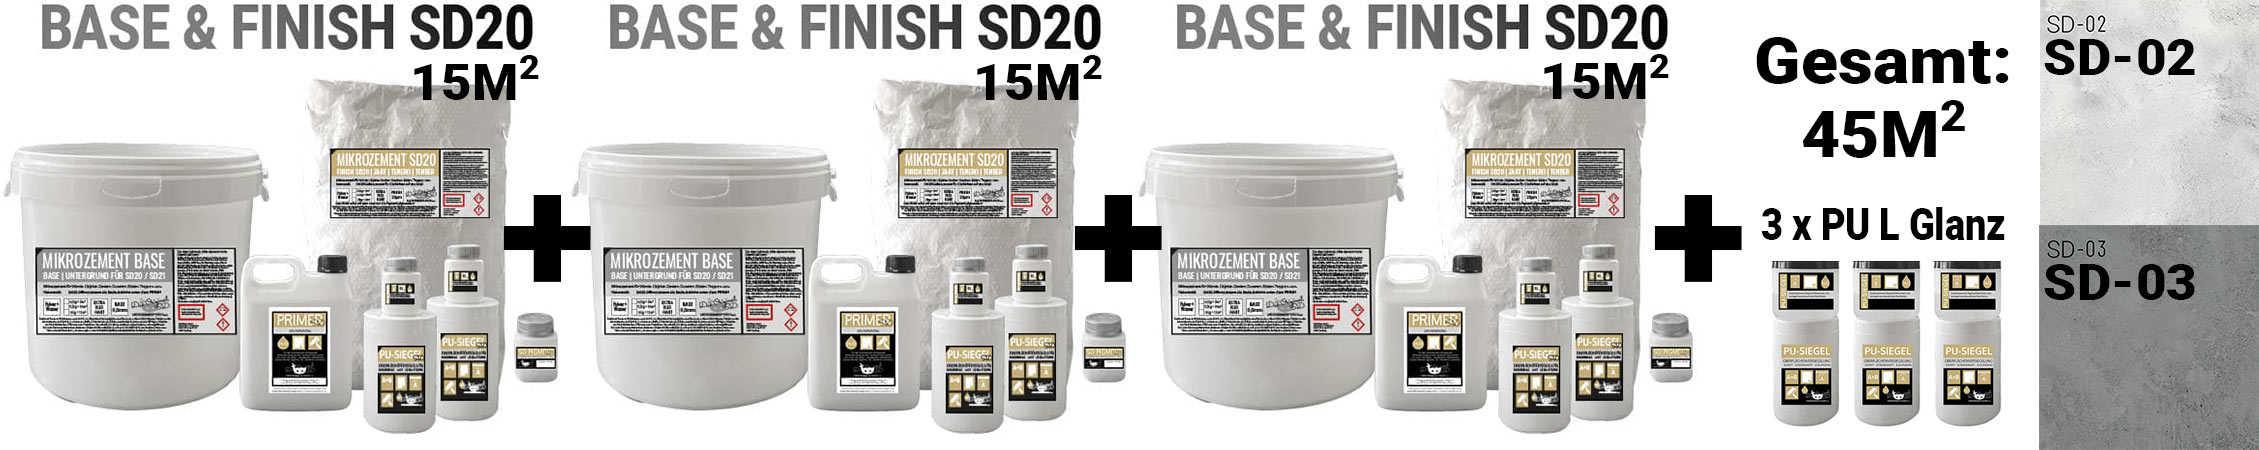 Mikrozement SD Set Aktion mit 45m2 komplett Angebot